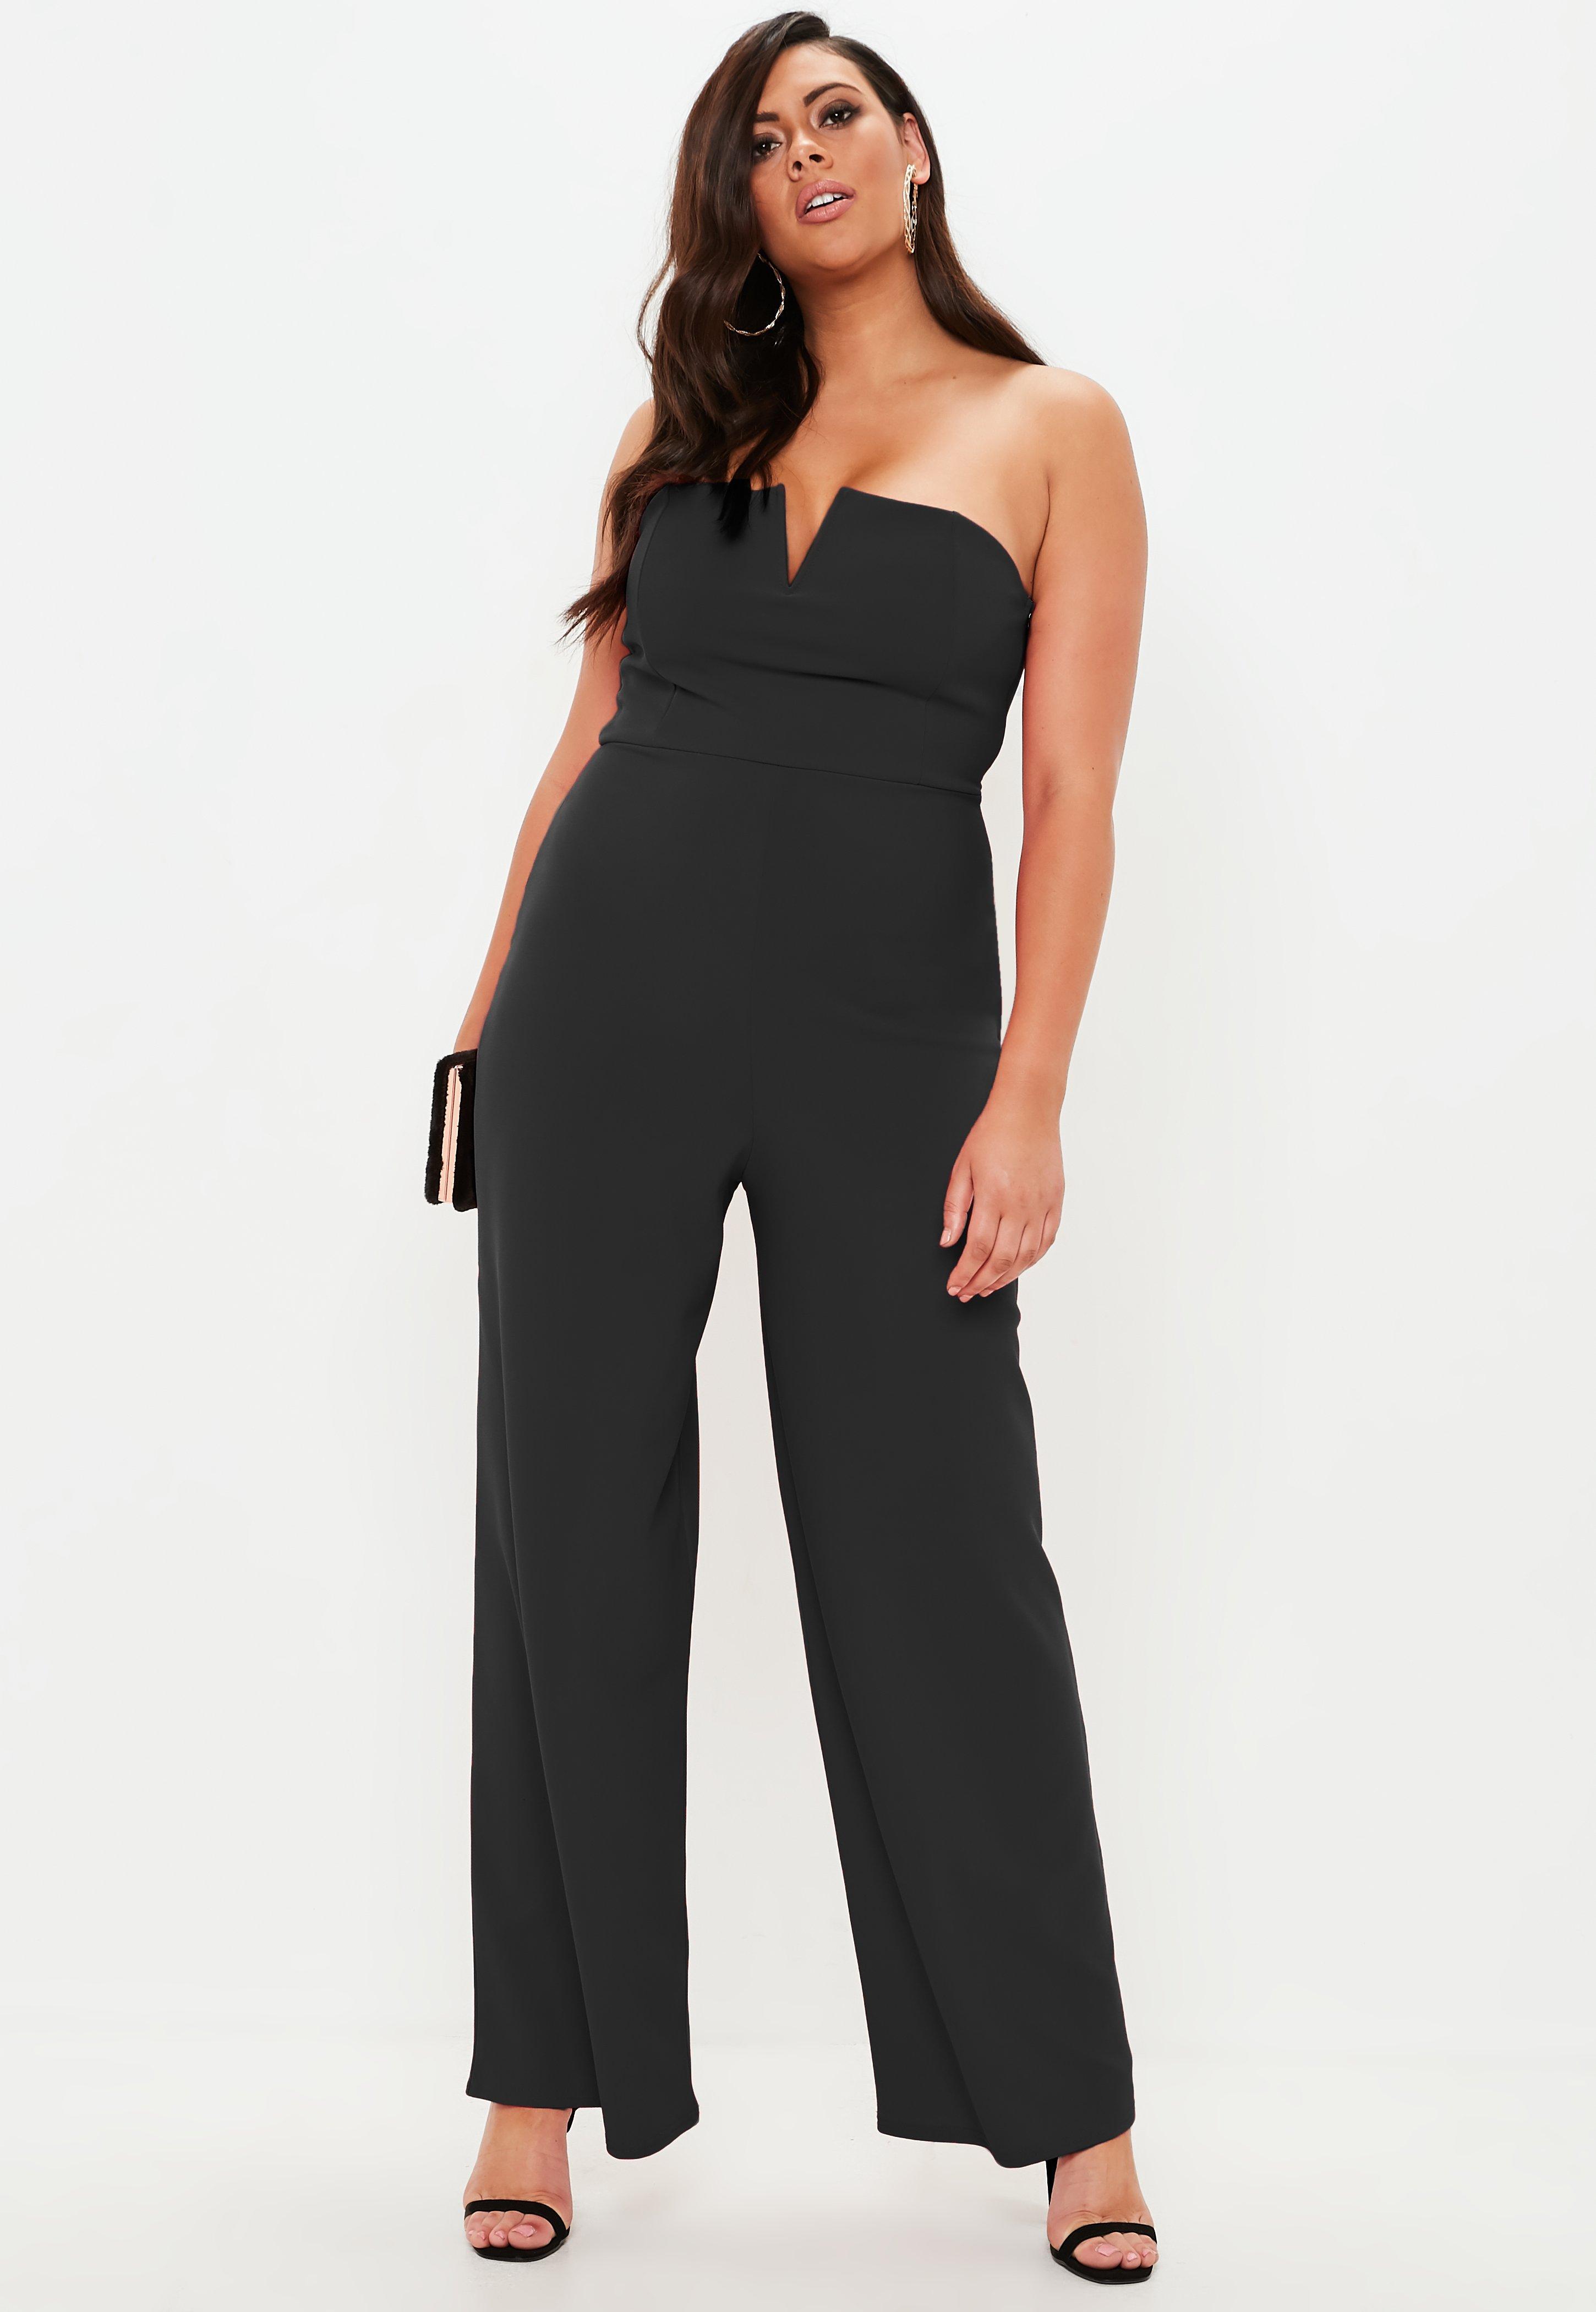 Size plus sundresses for women best photo